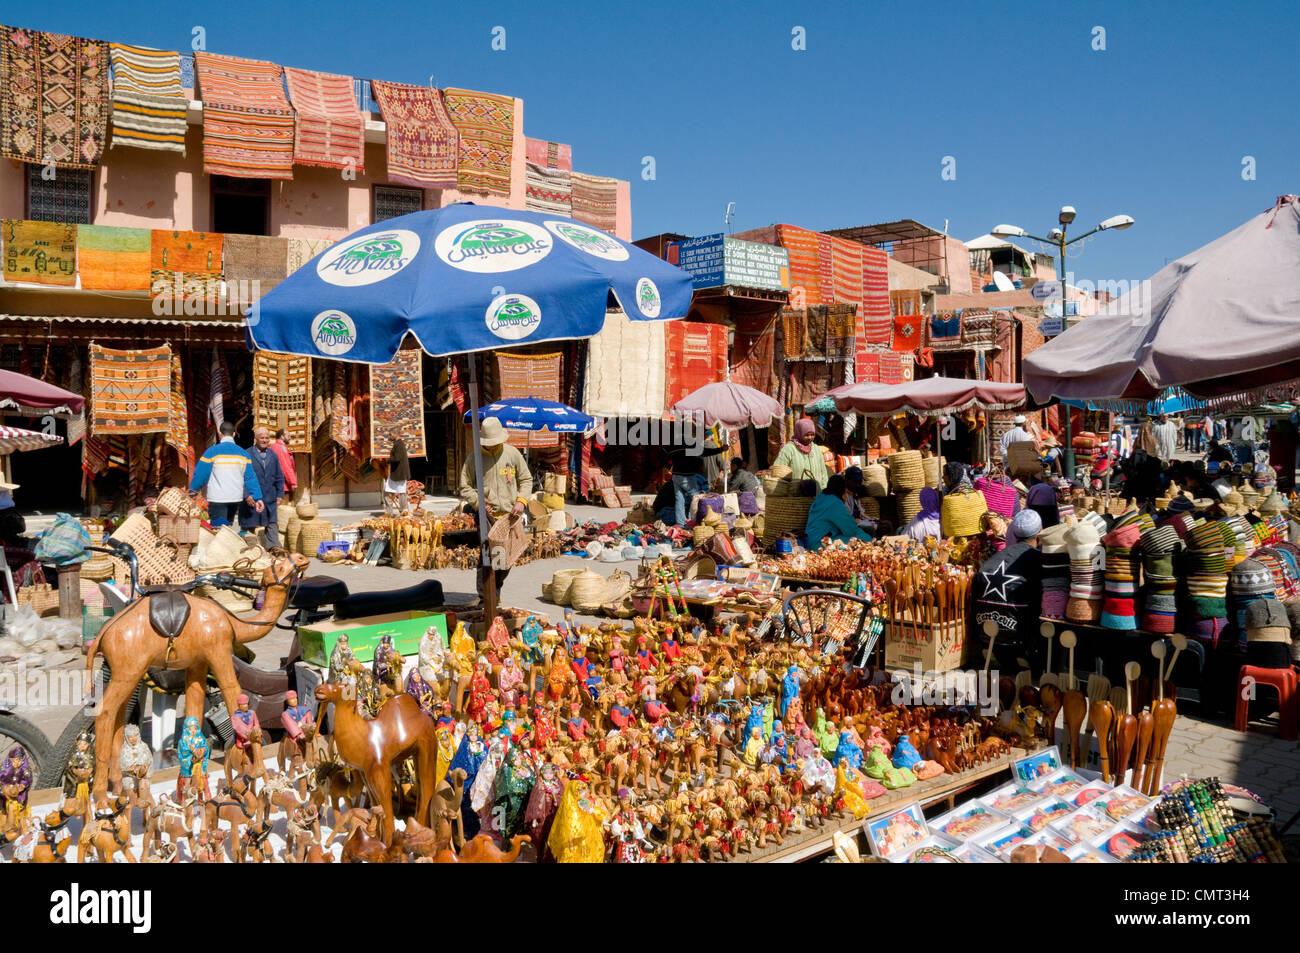 Morocco, Marrakech  - Market souk at Rahba Qedima in Medina district, Marrakech, Morocco - Stock Image